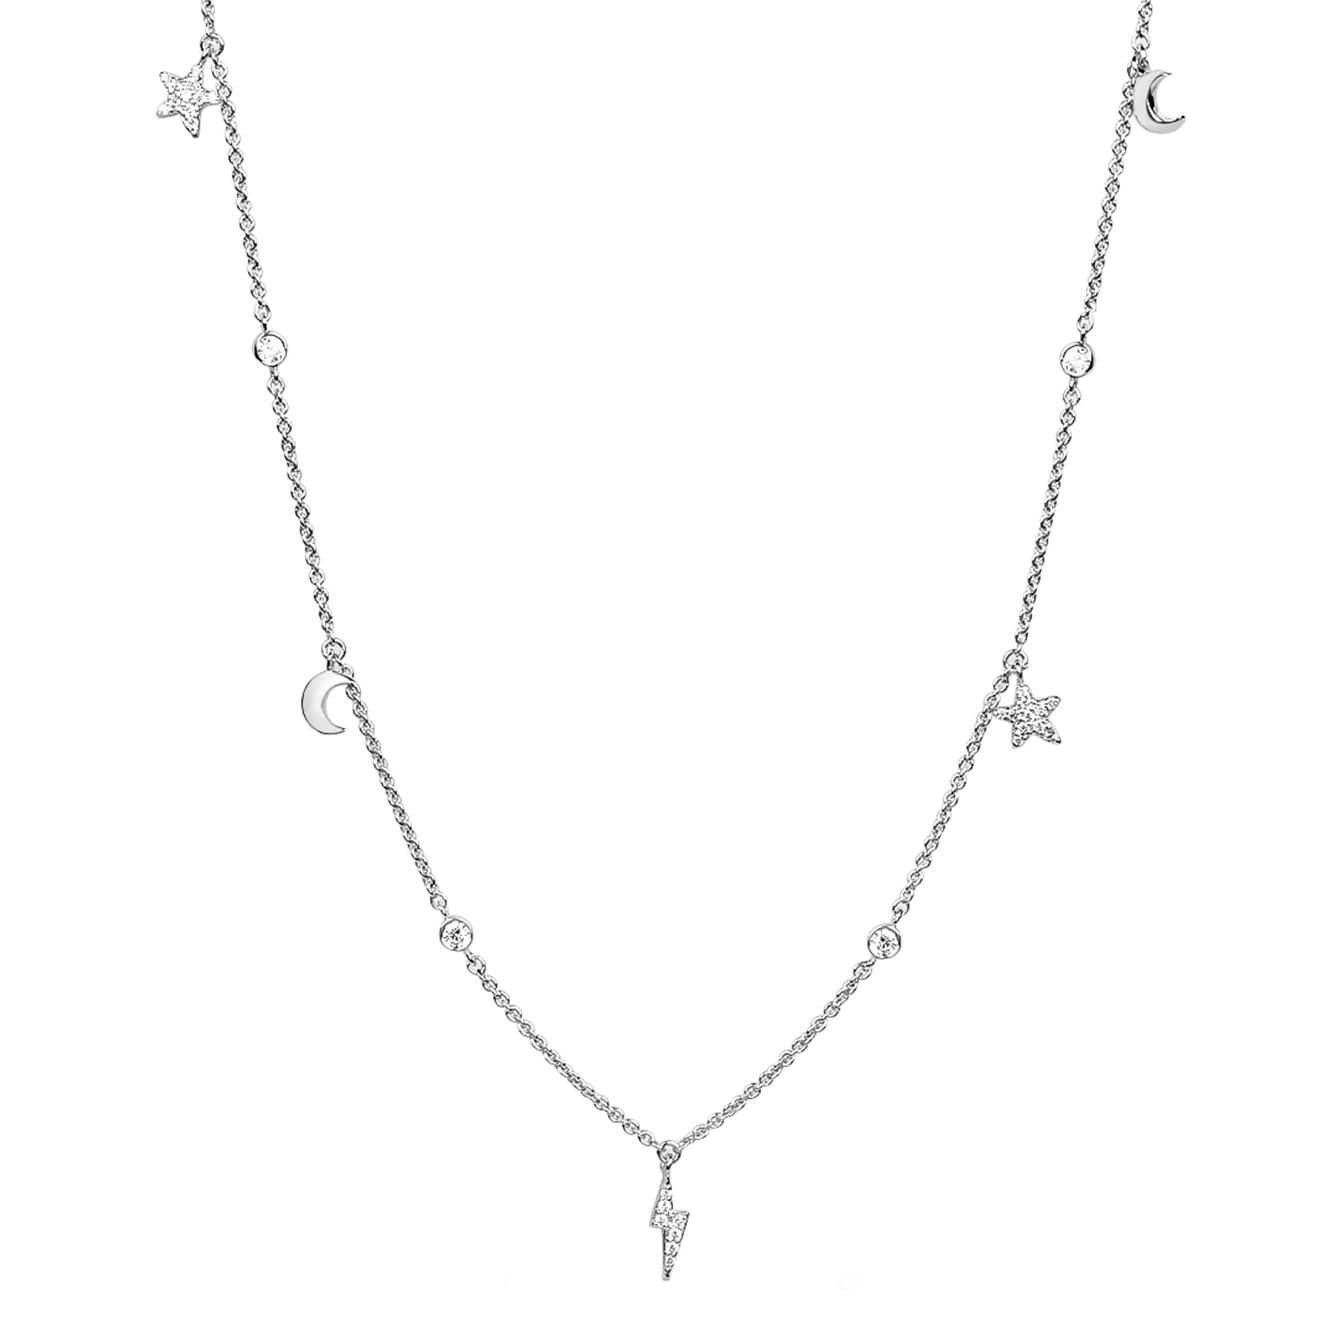 LAVZ Серебряное колье Universe Necklace, из коллекции